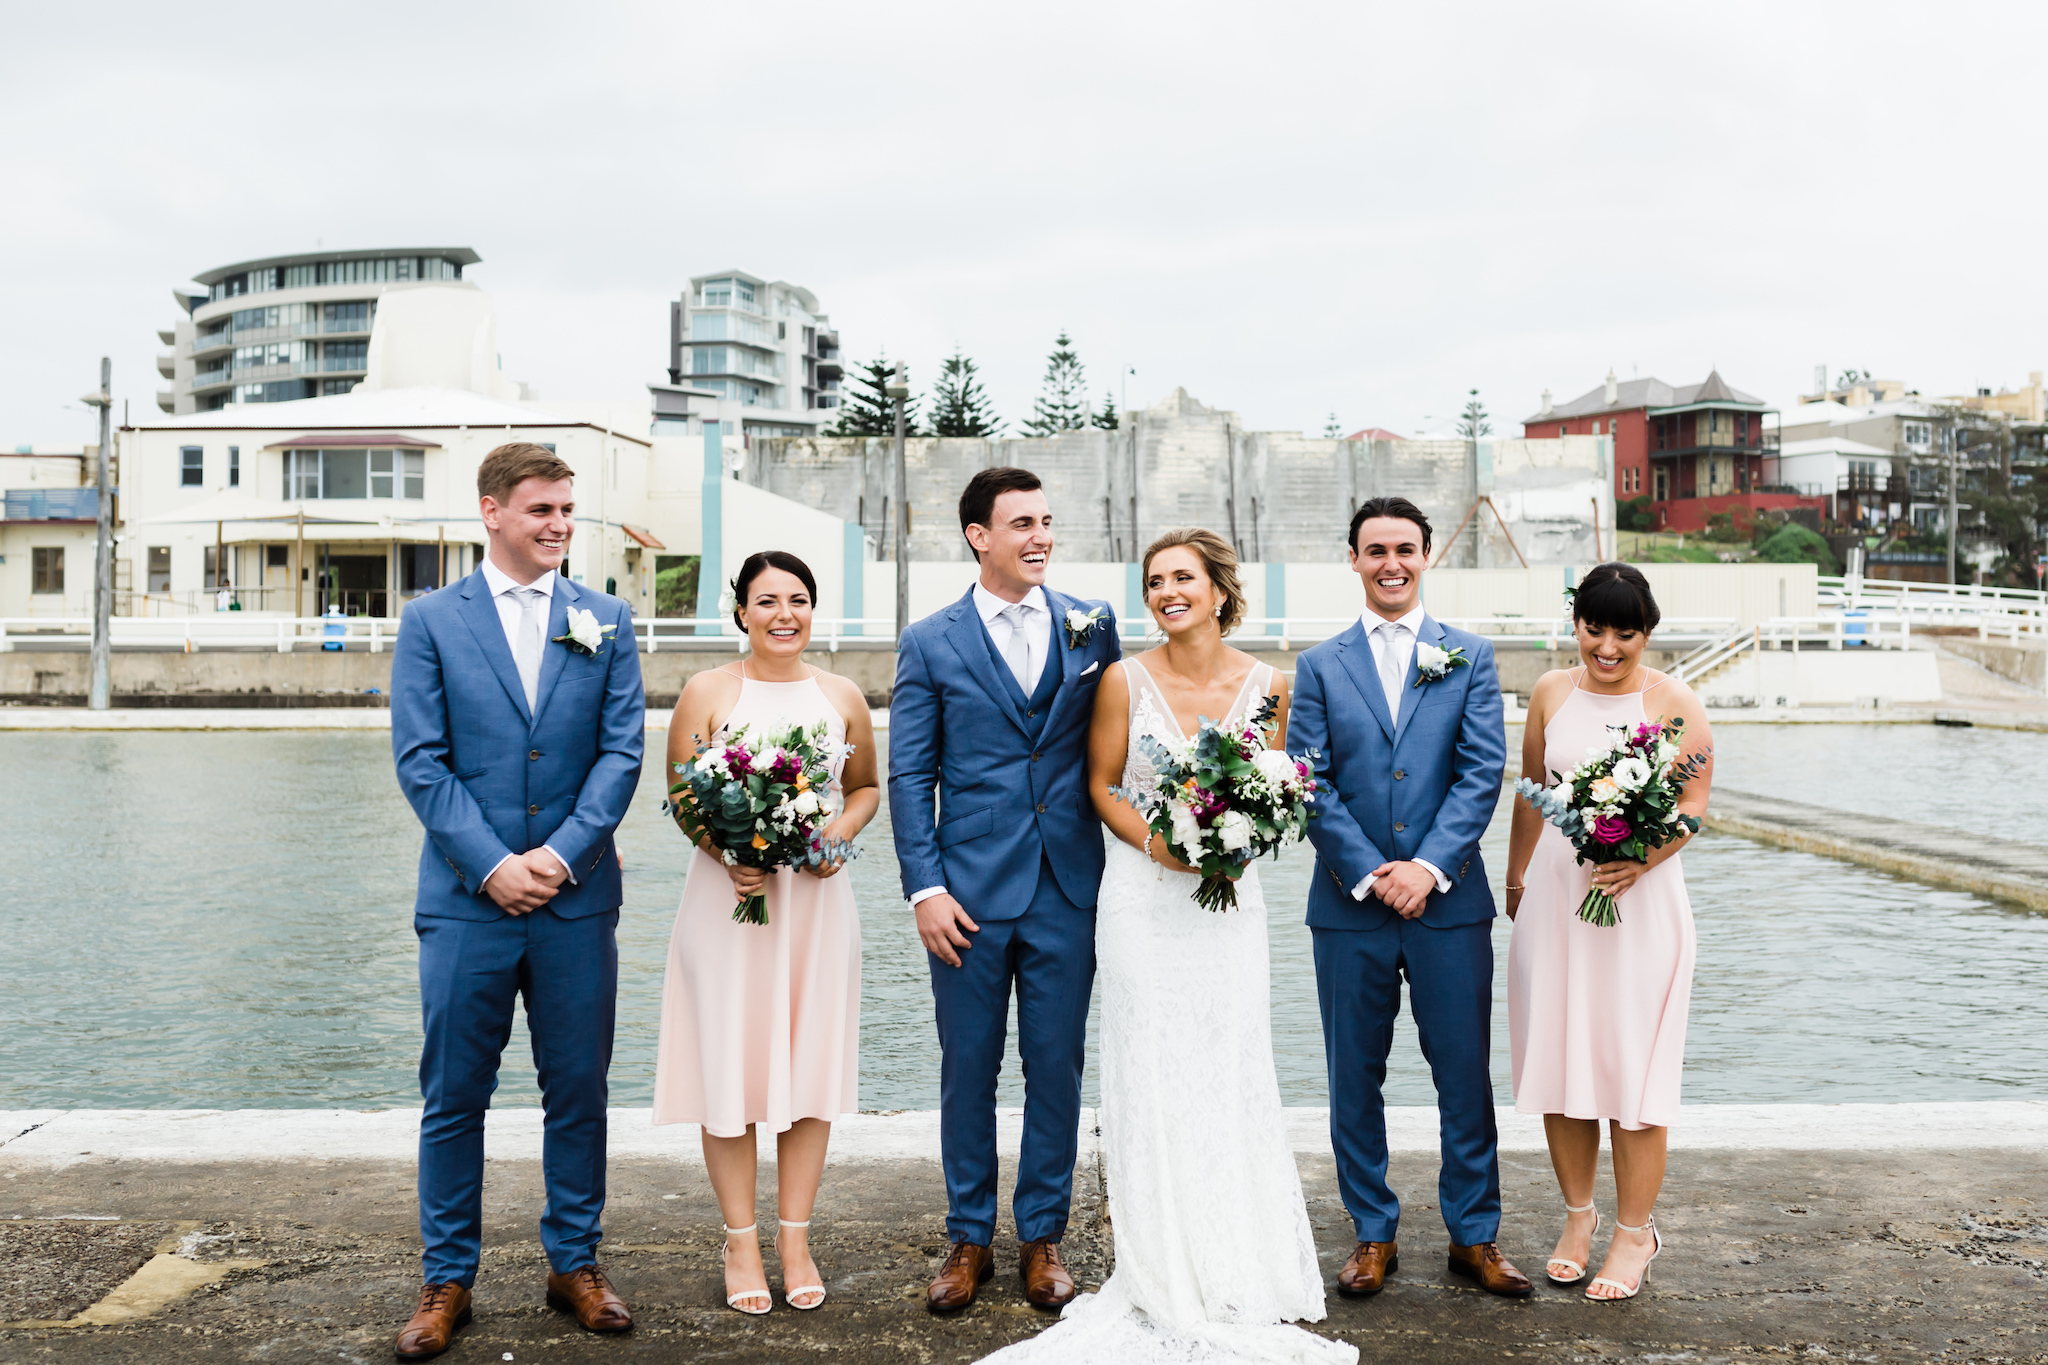 467-SOPHIE  DYLAN WEDDING.jpg